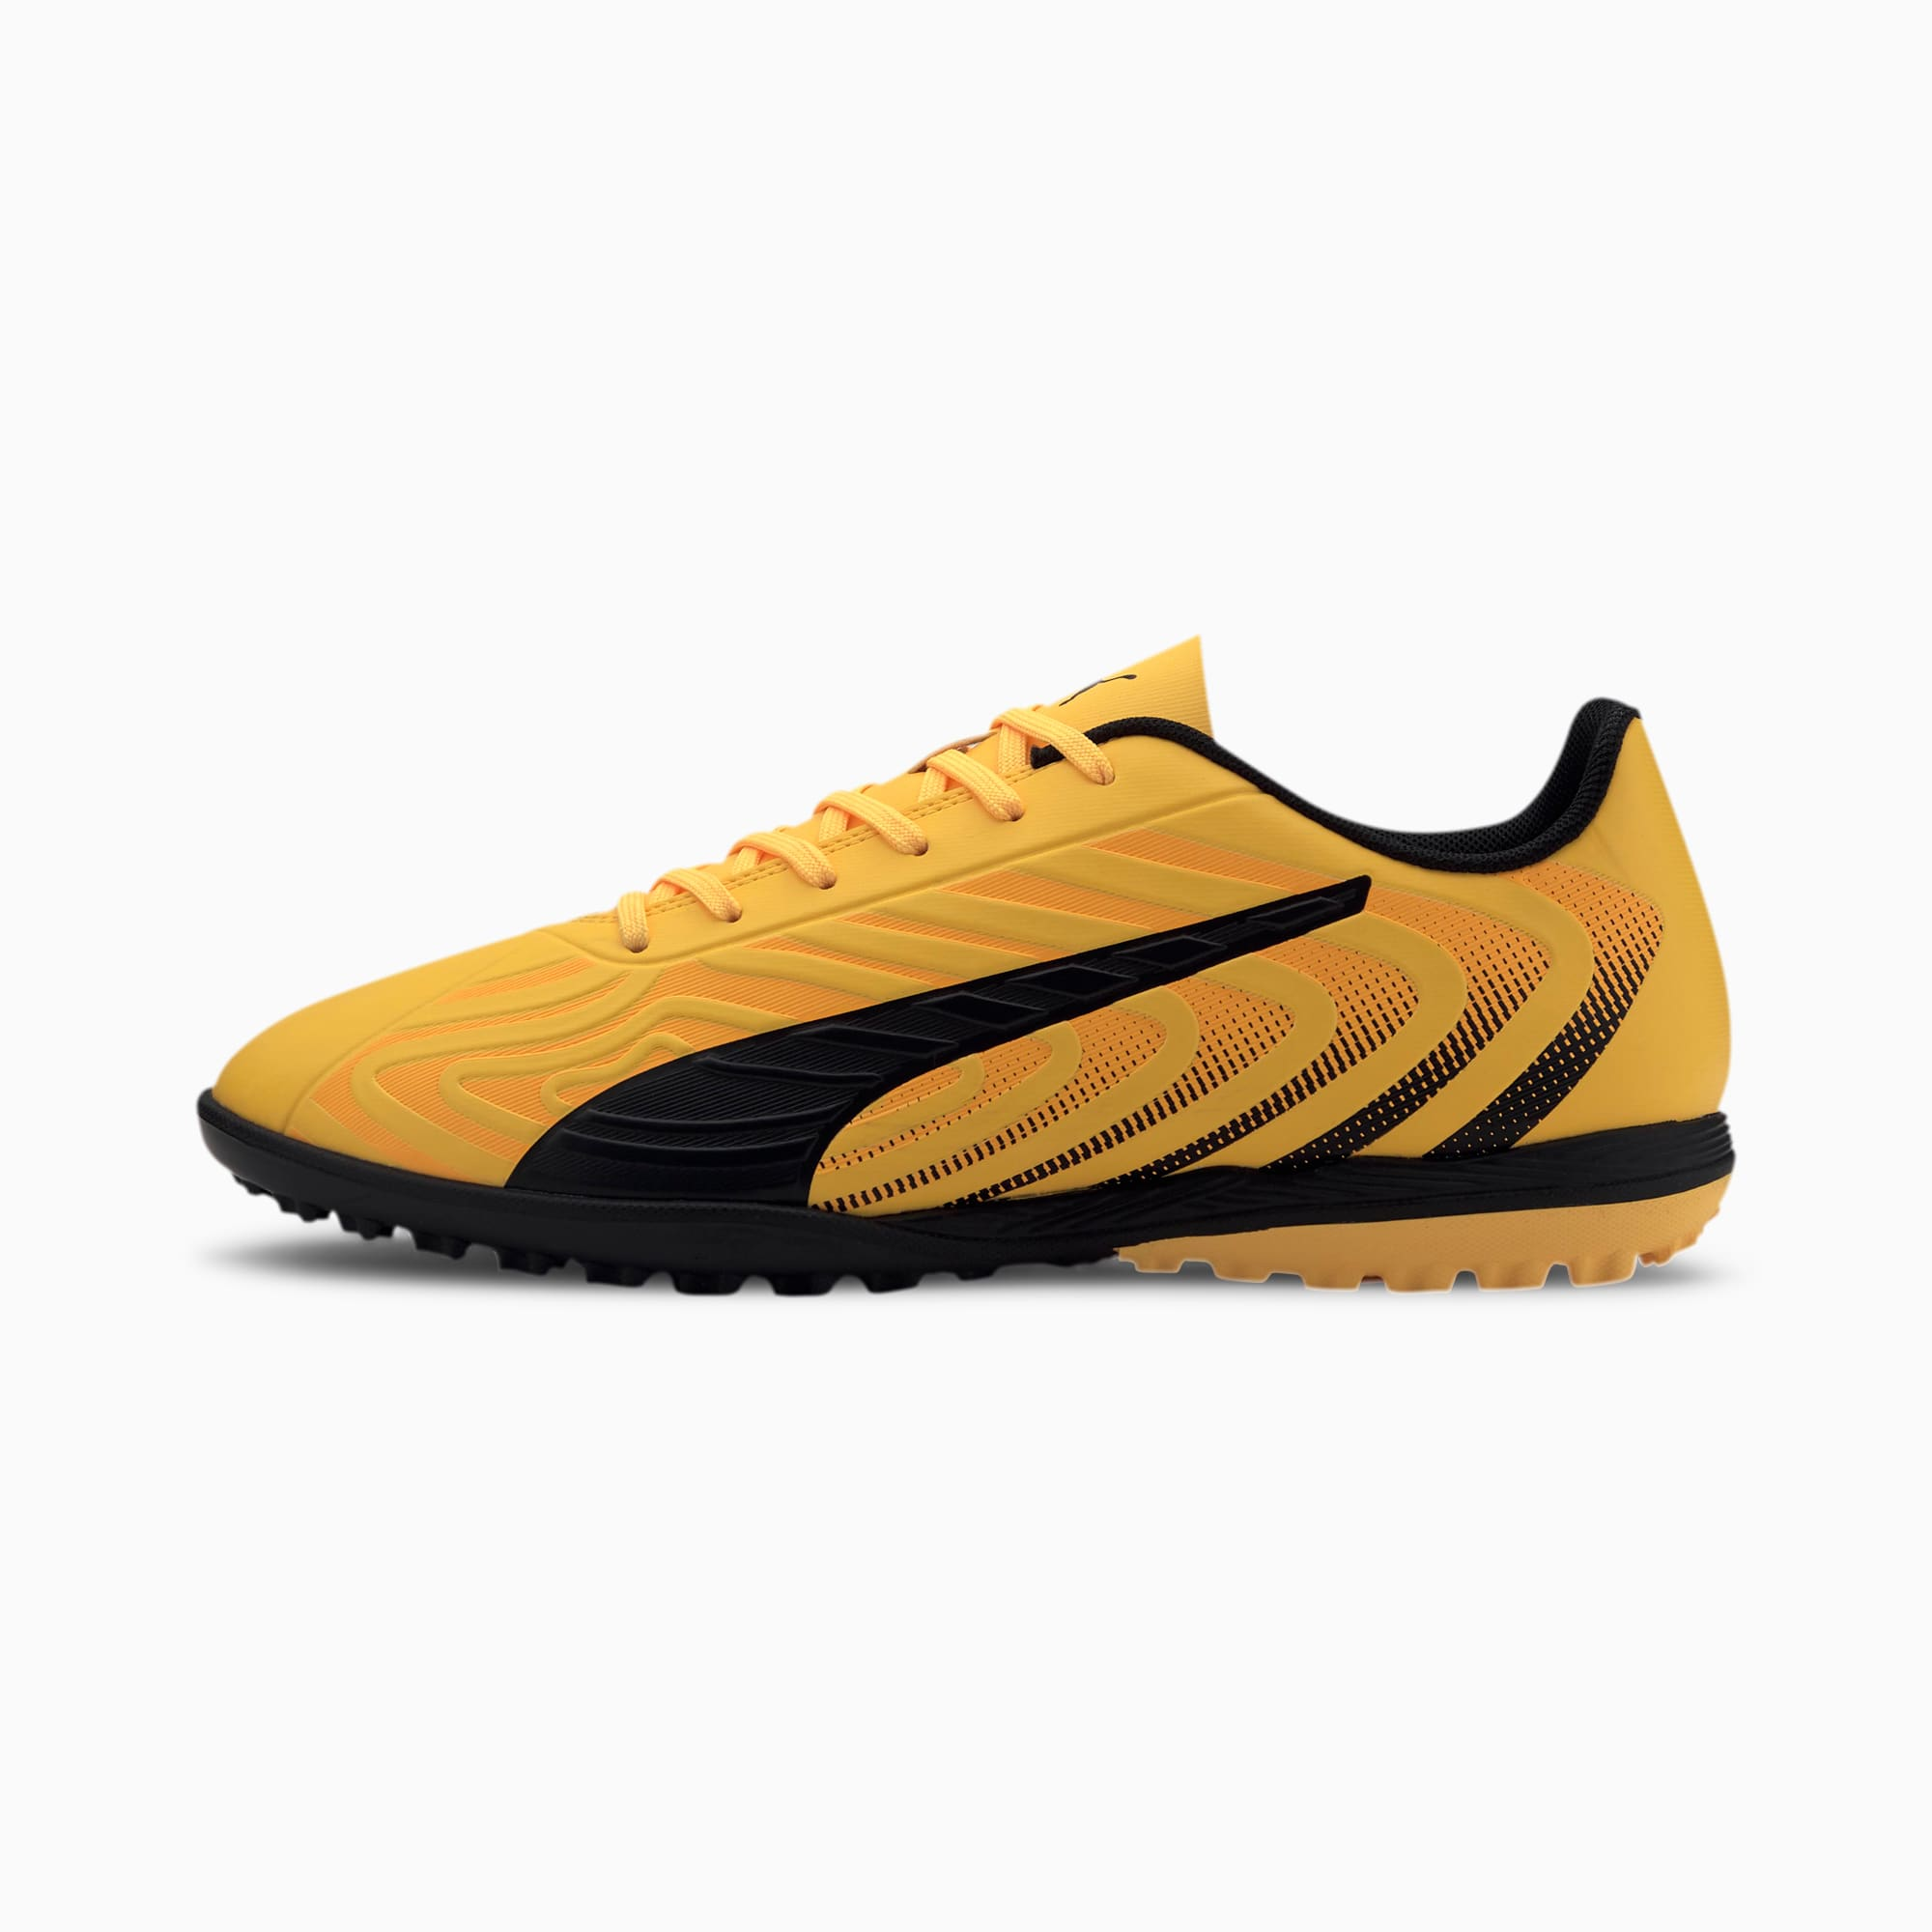 PUMA ONE 20.4 TT Men's Football Boots